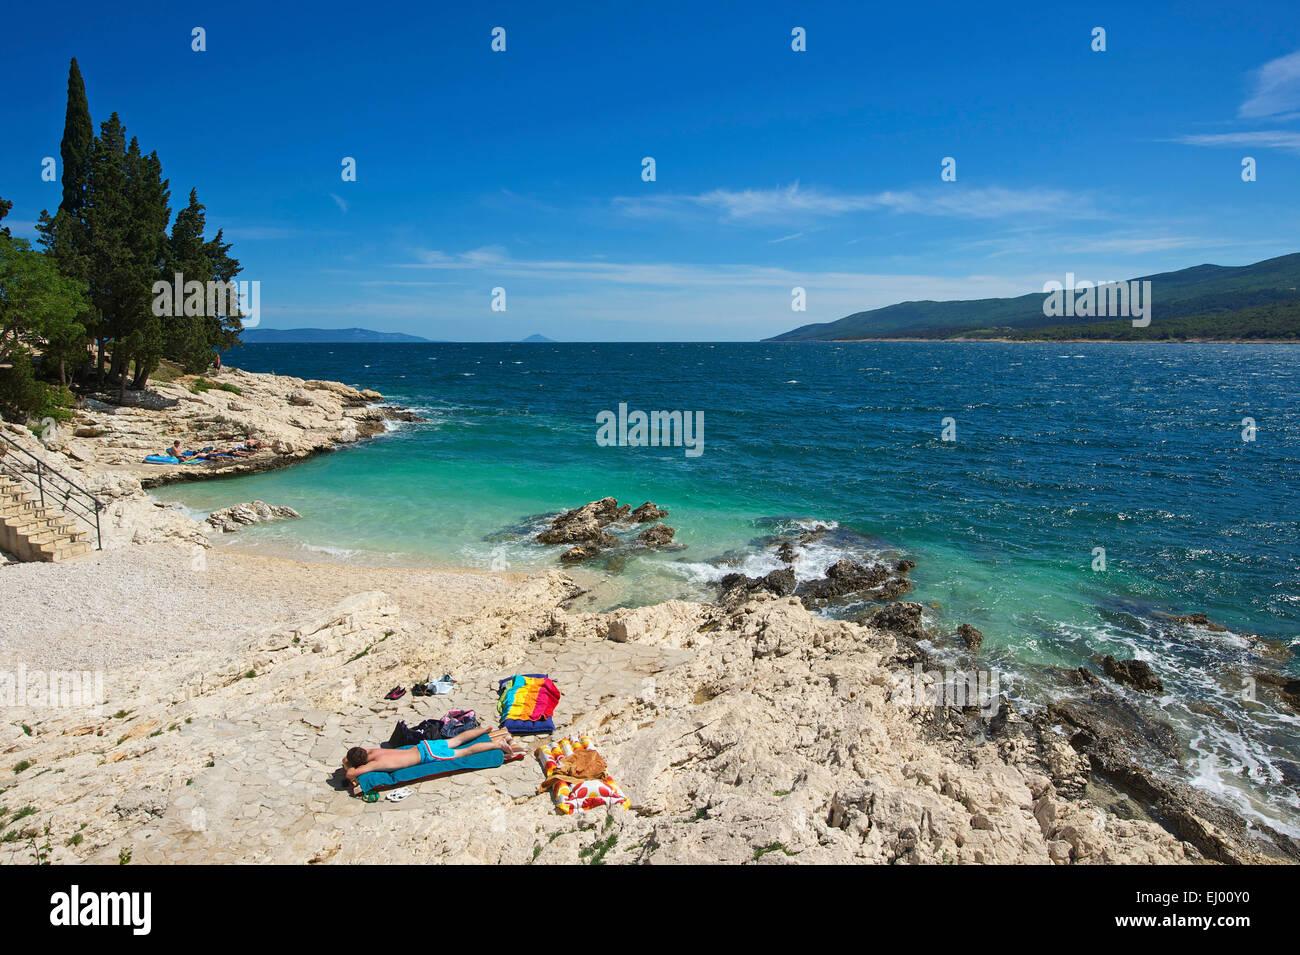 Istria, Europe, Croatia, outside, day, Rabac, Adriatic, Mediterranean Sea, sea, coast, sand beach, beach, seashore, - Stock Image